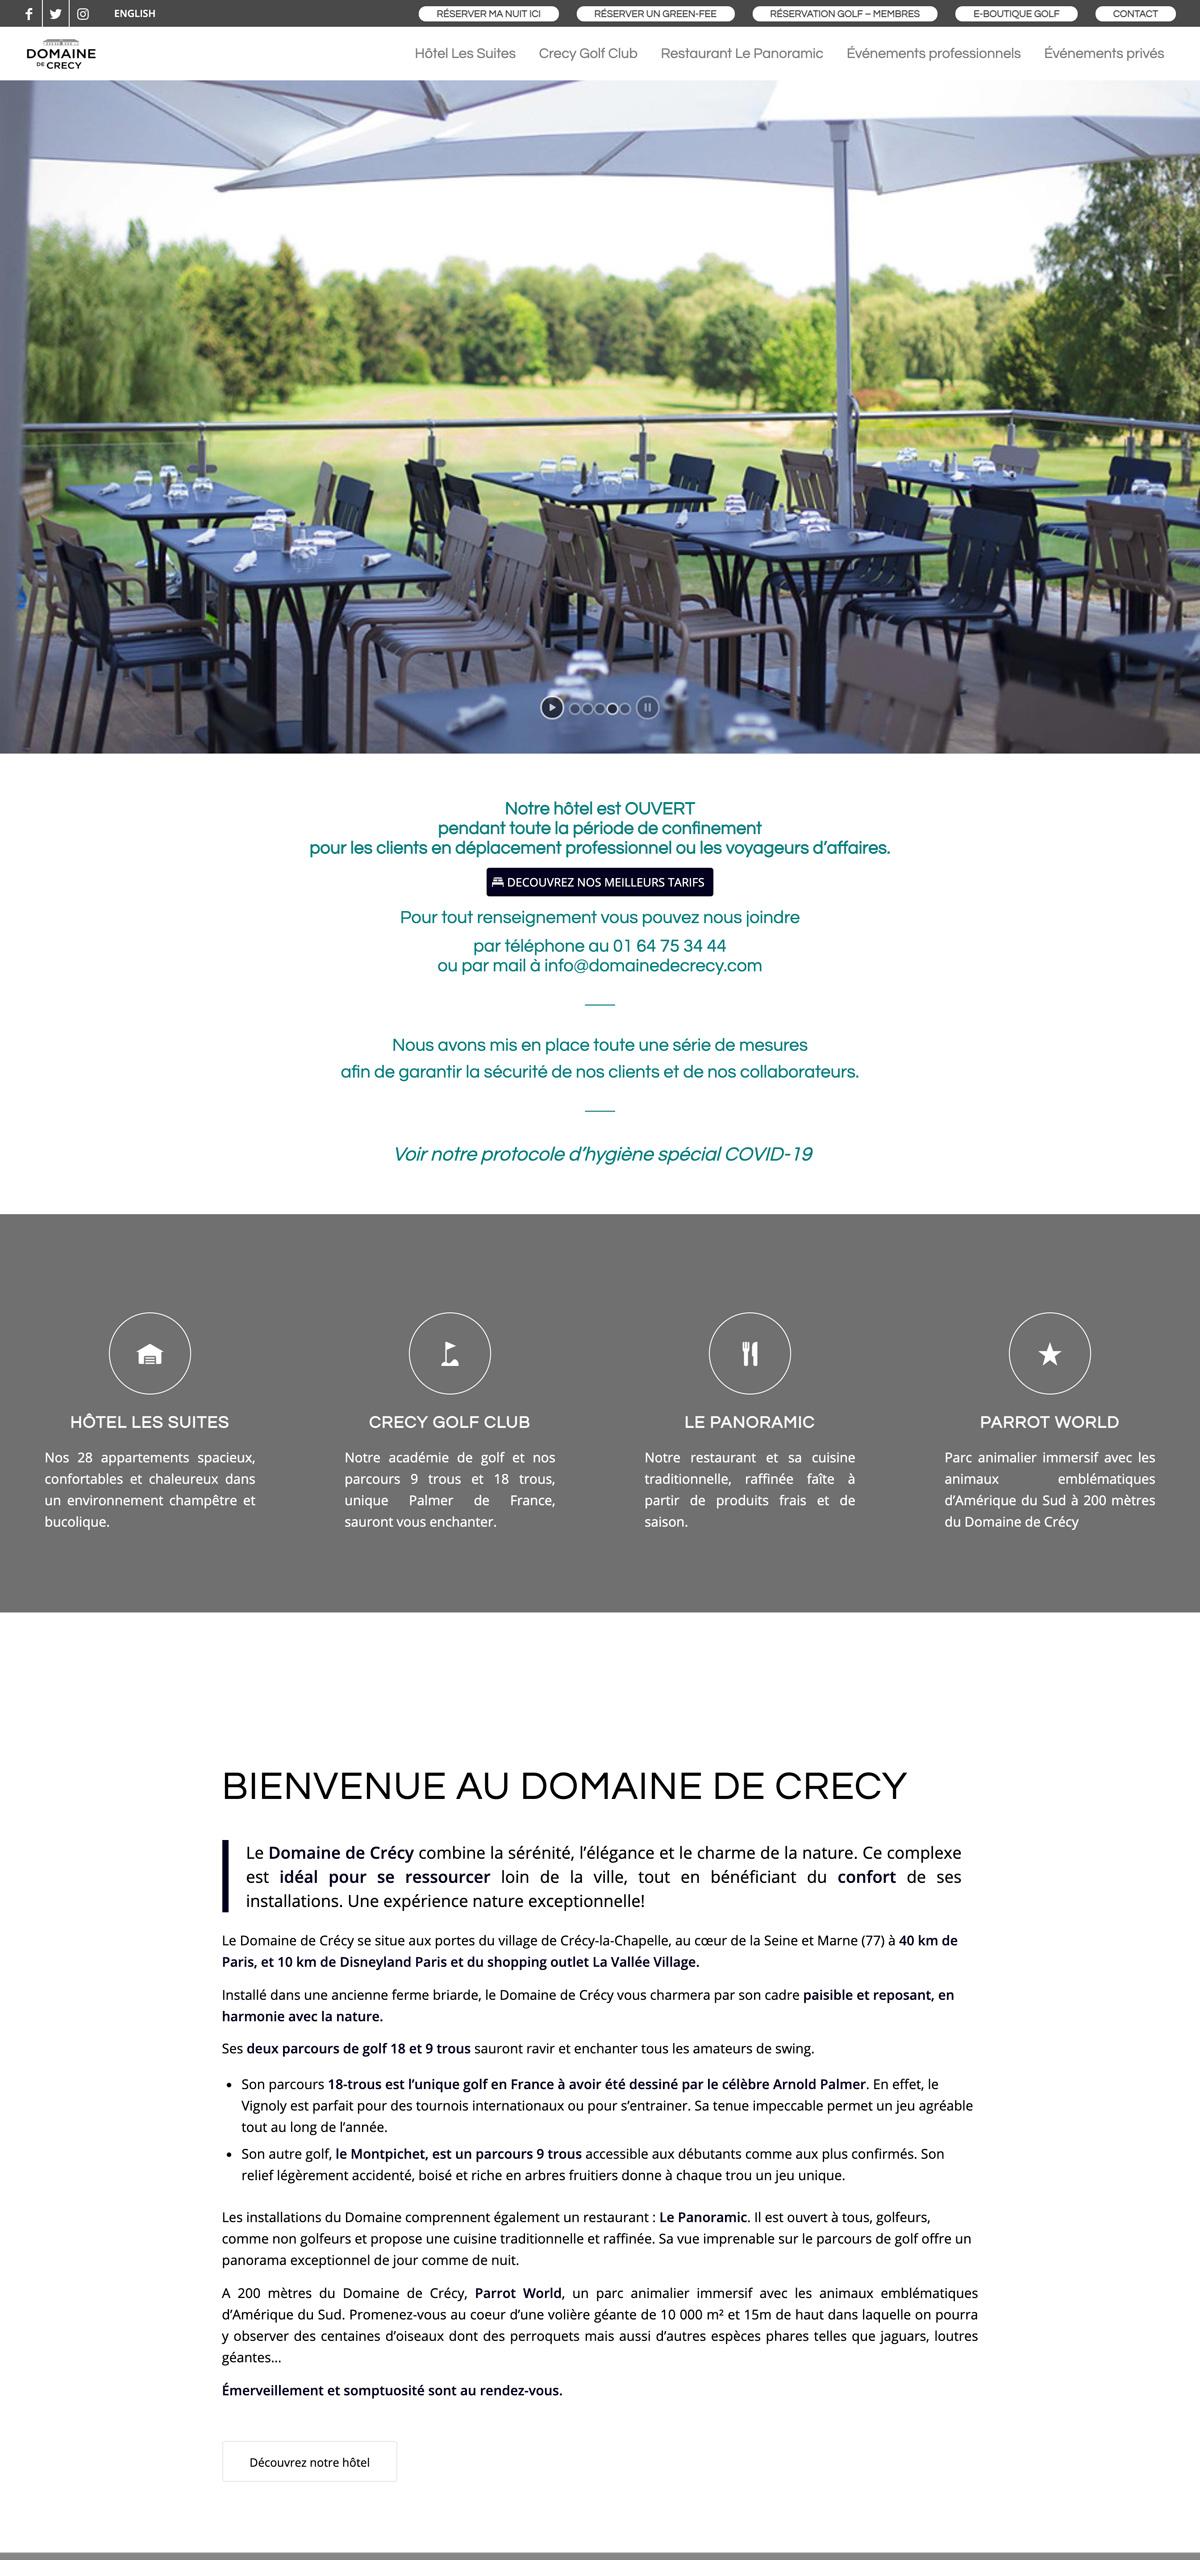 rdsc domaine crecy website screenshot